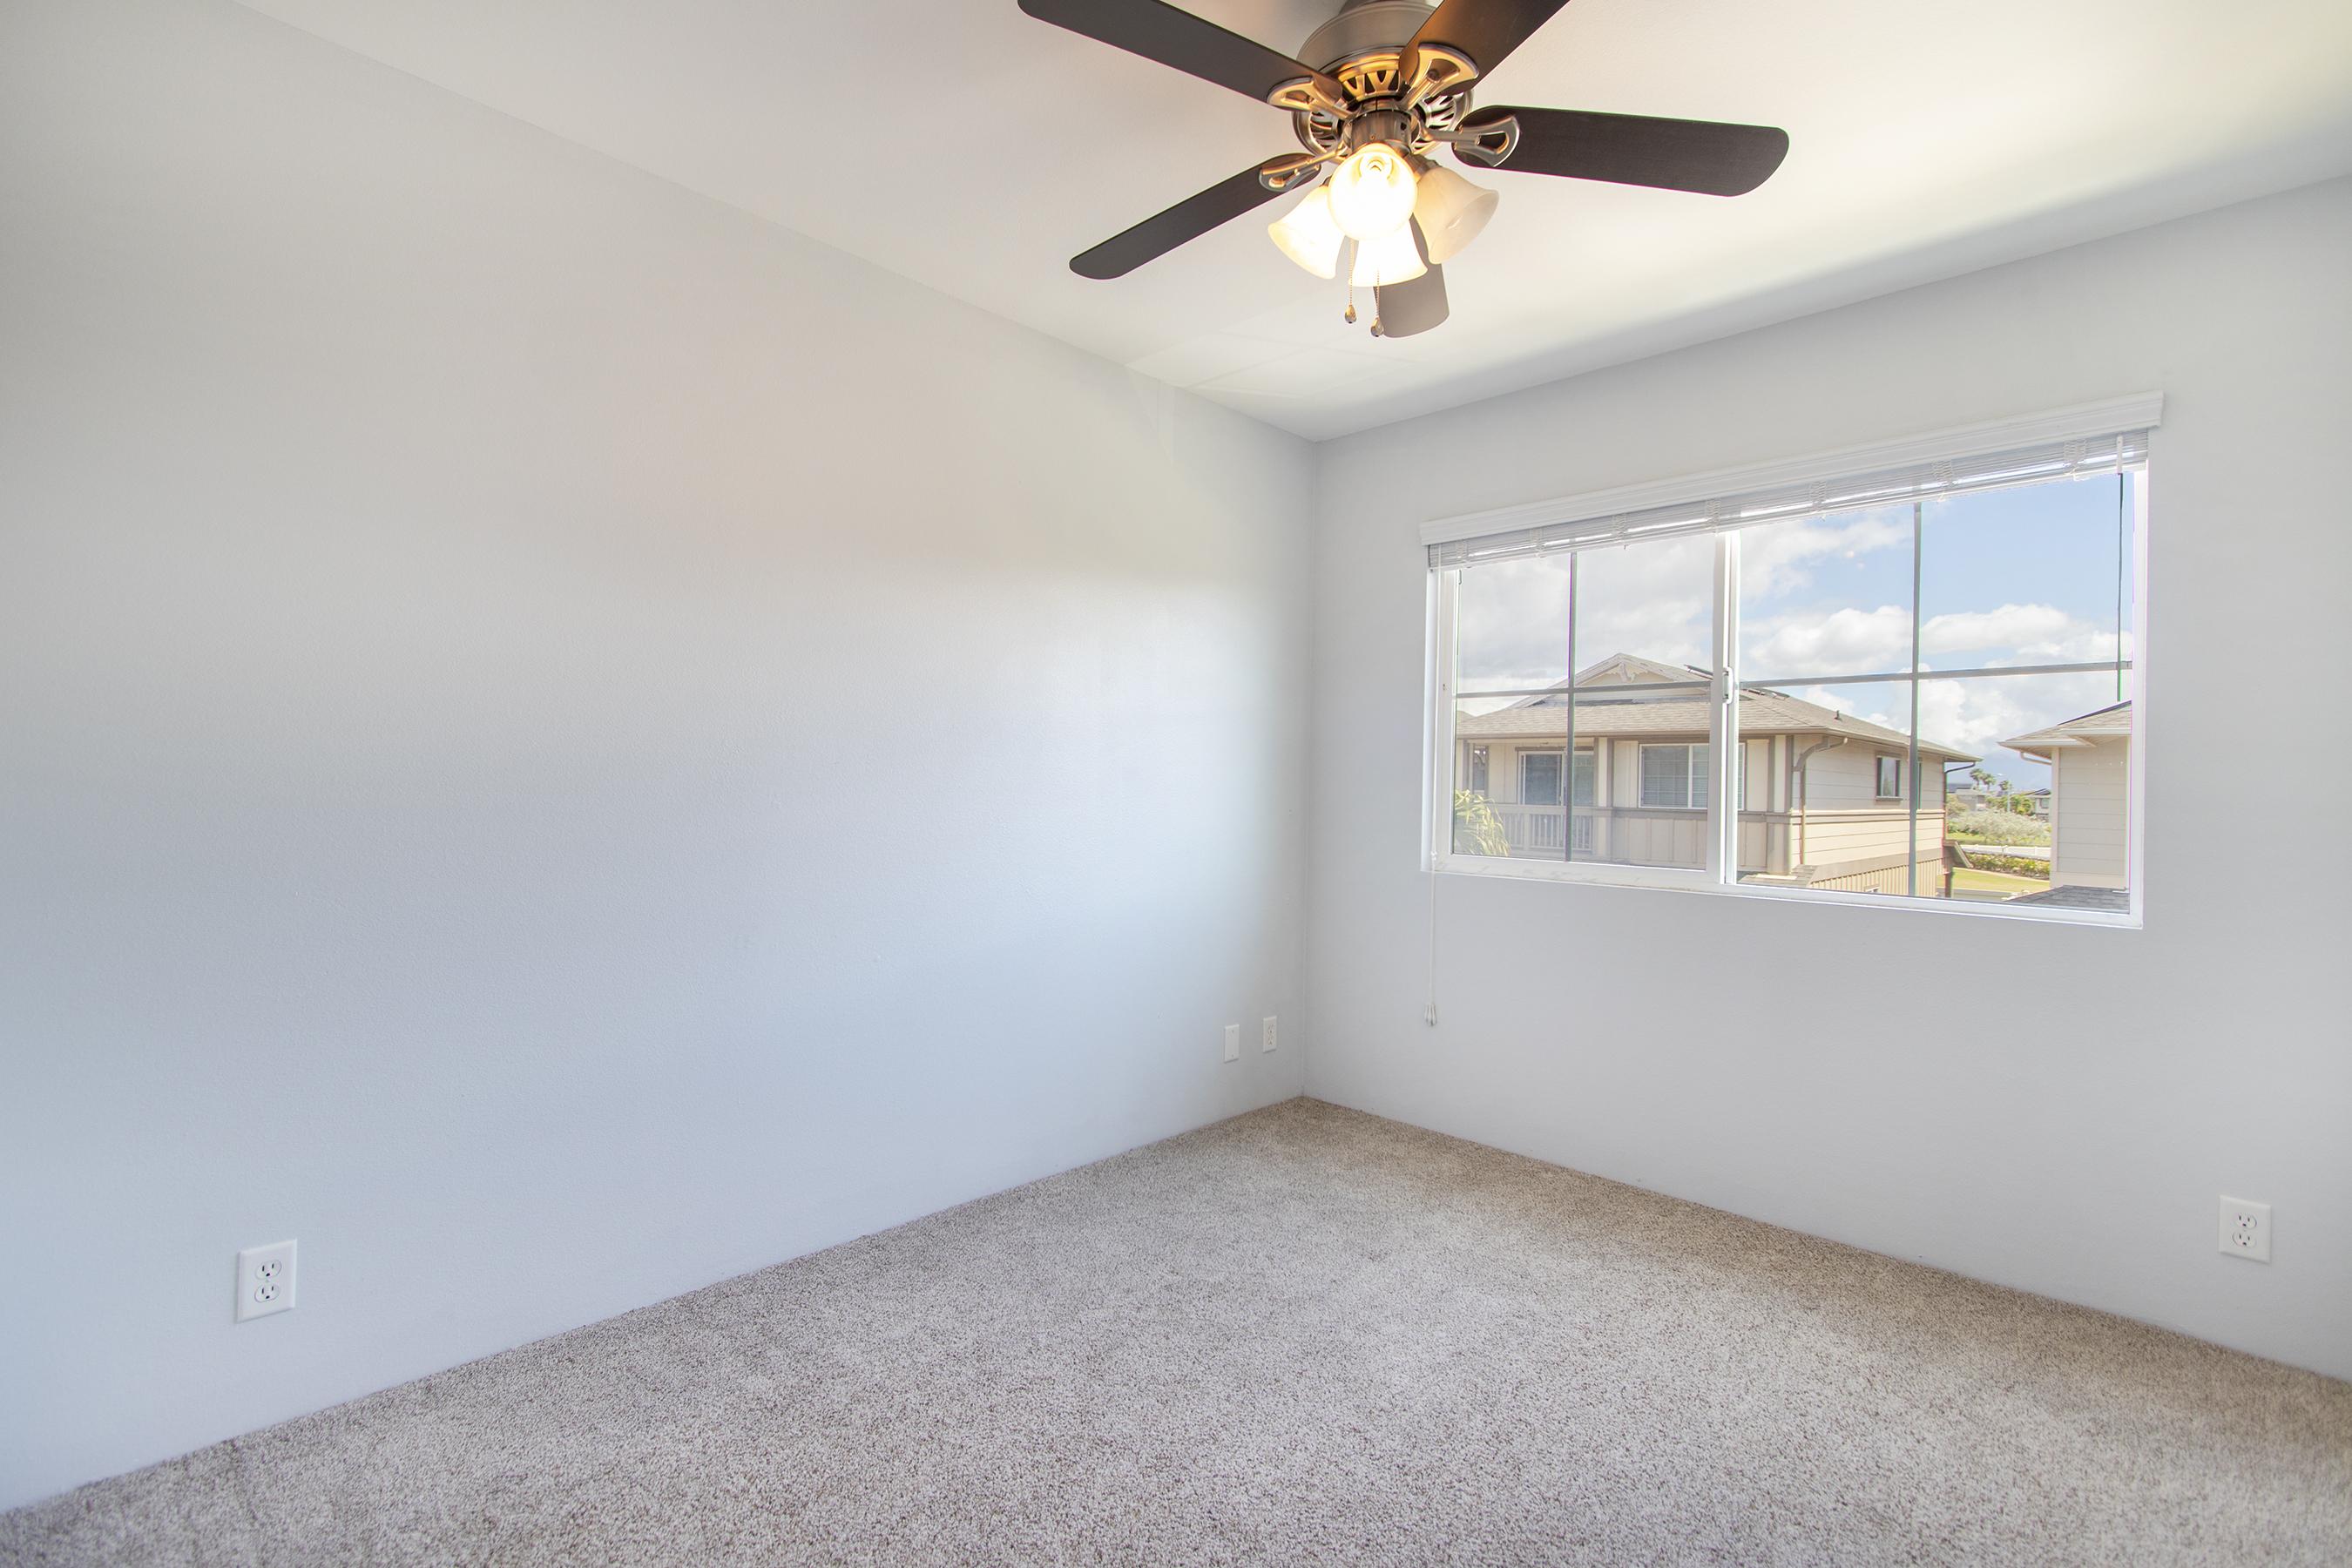 Bedroom 3 at 91-1200 Keaunui Drive #14